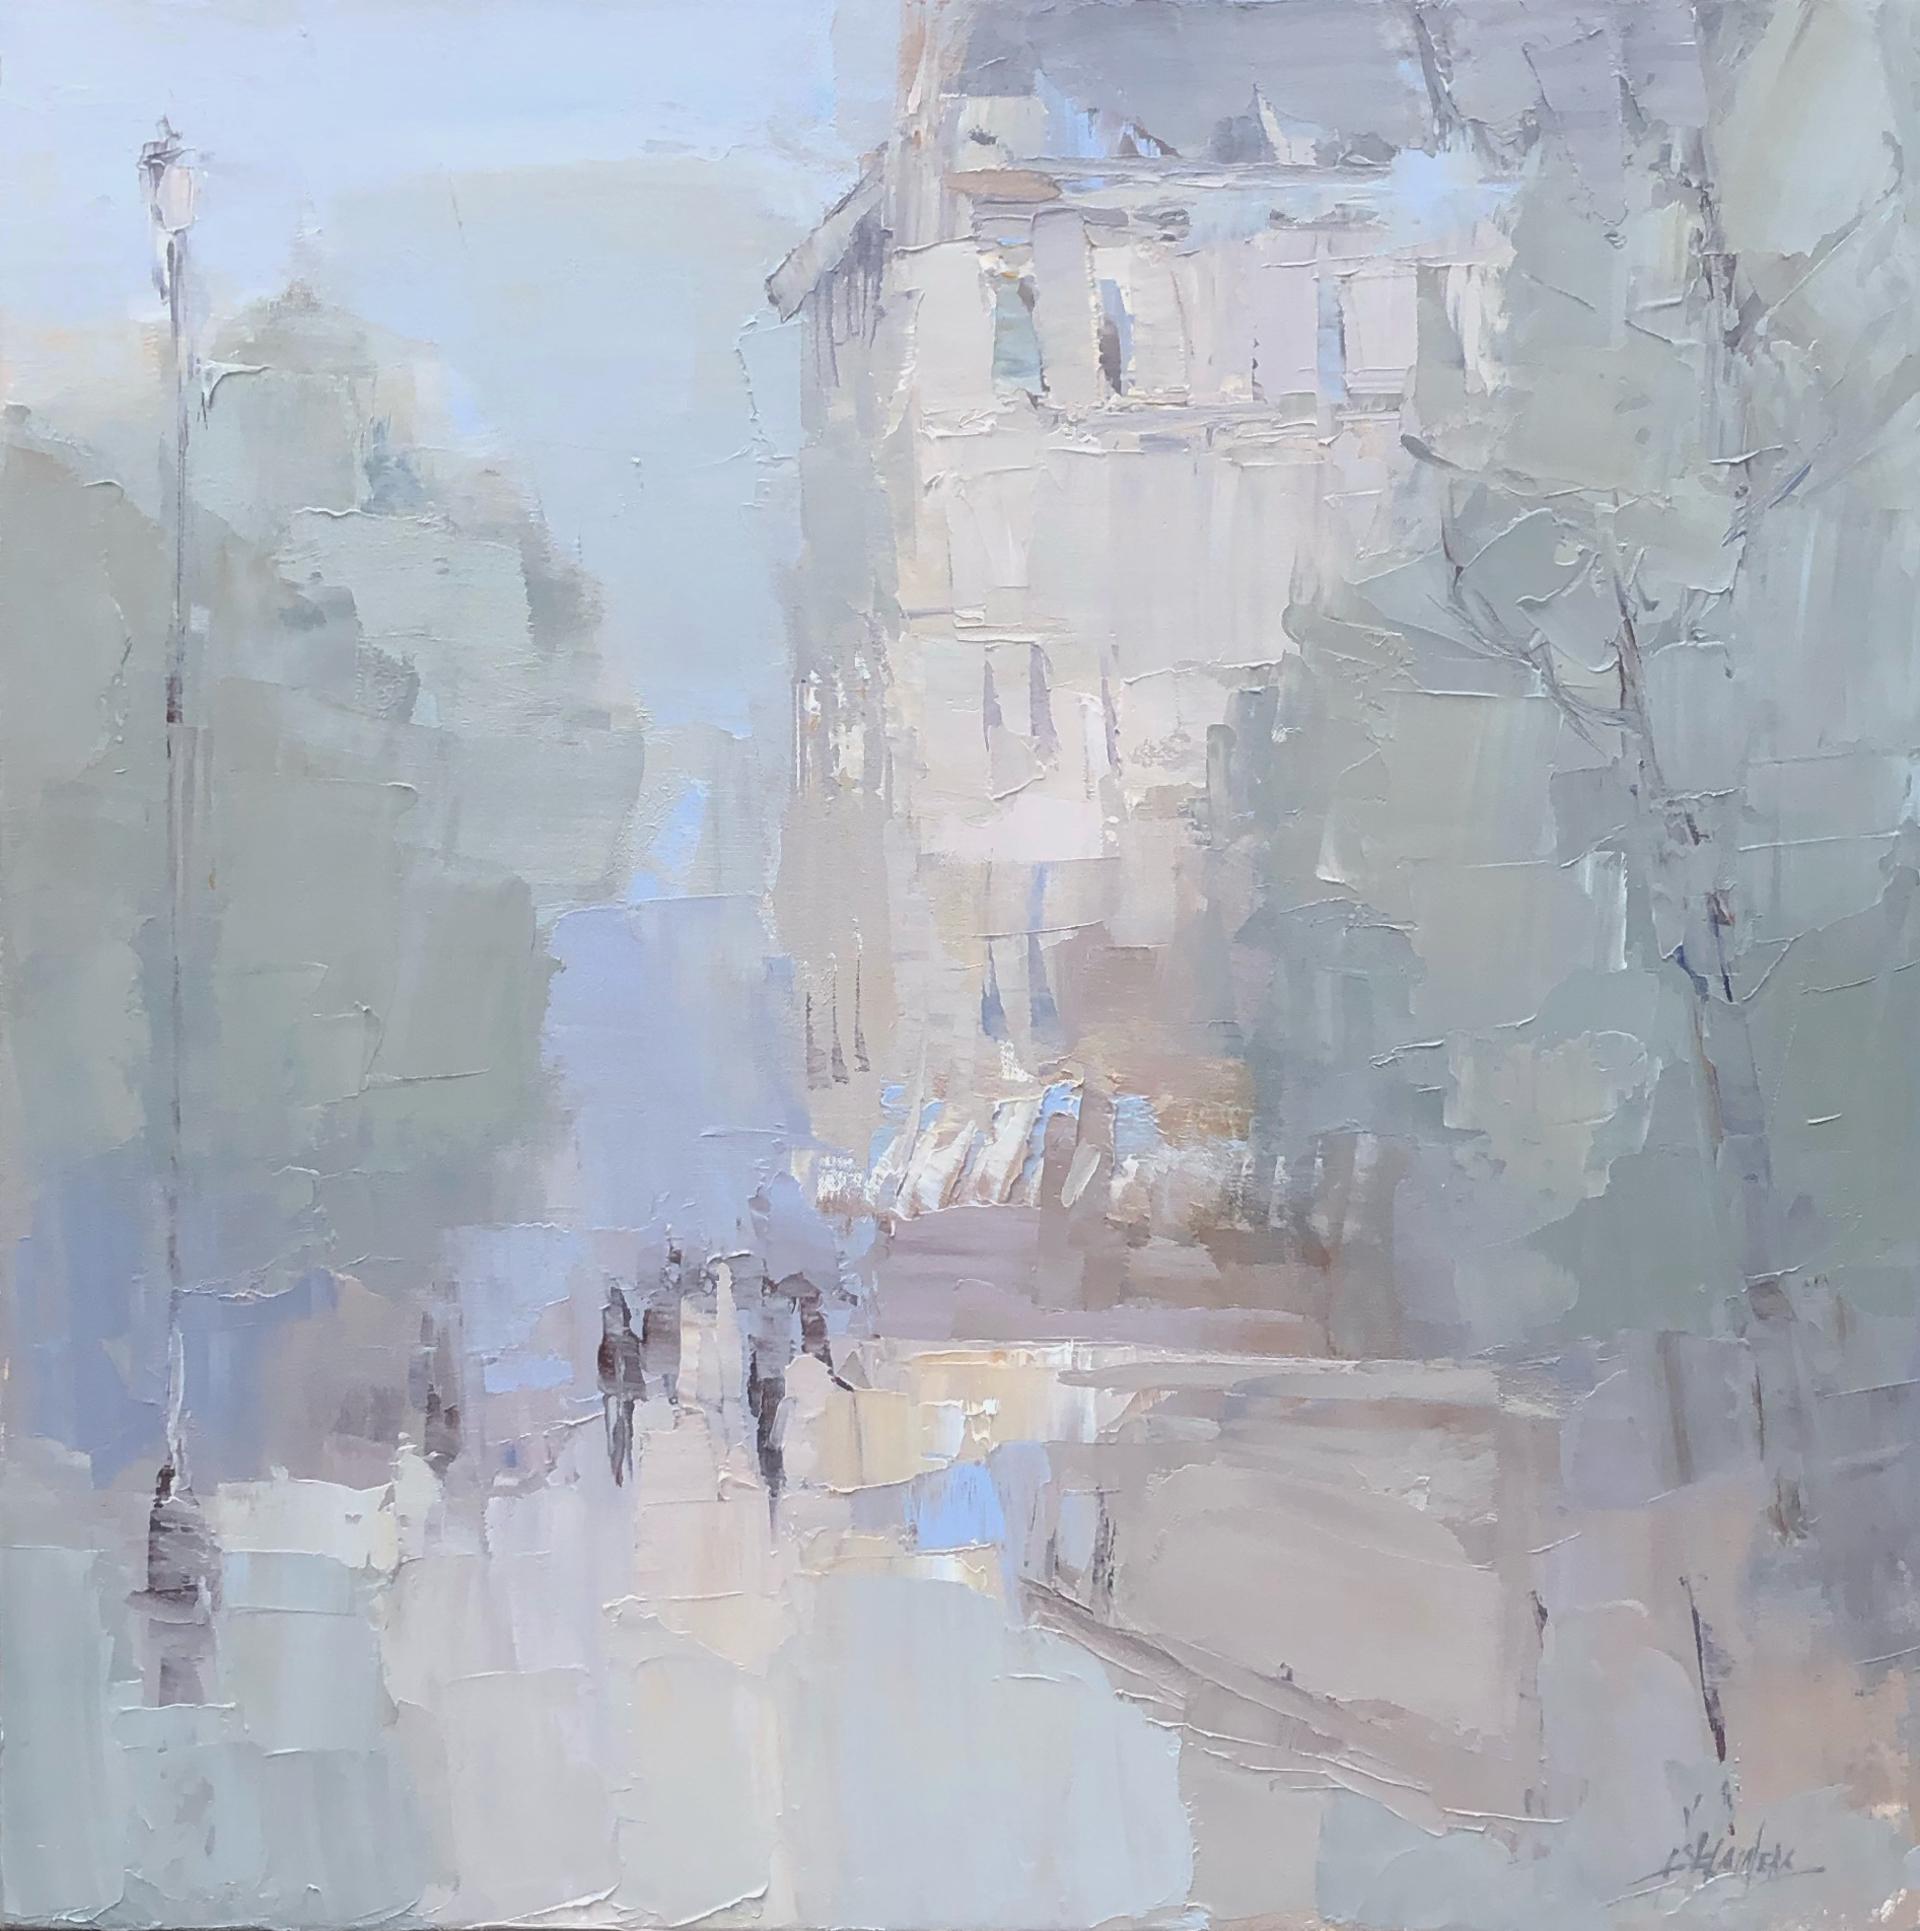 Hazy Summer Day, Paris by Barbara Flowers